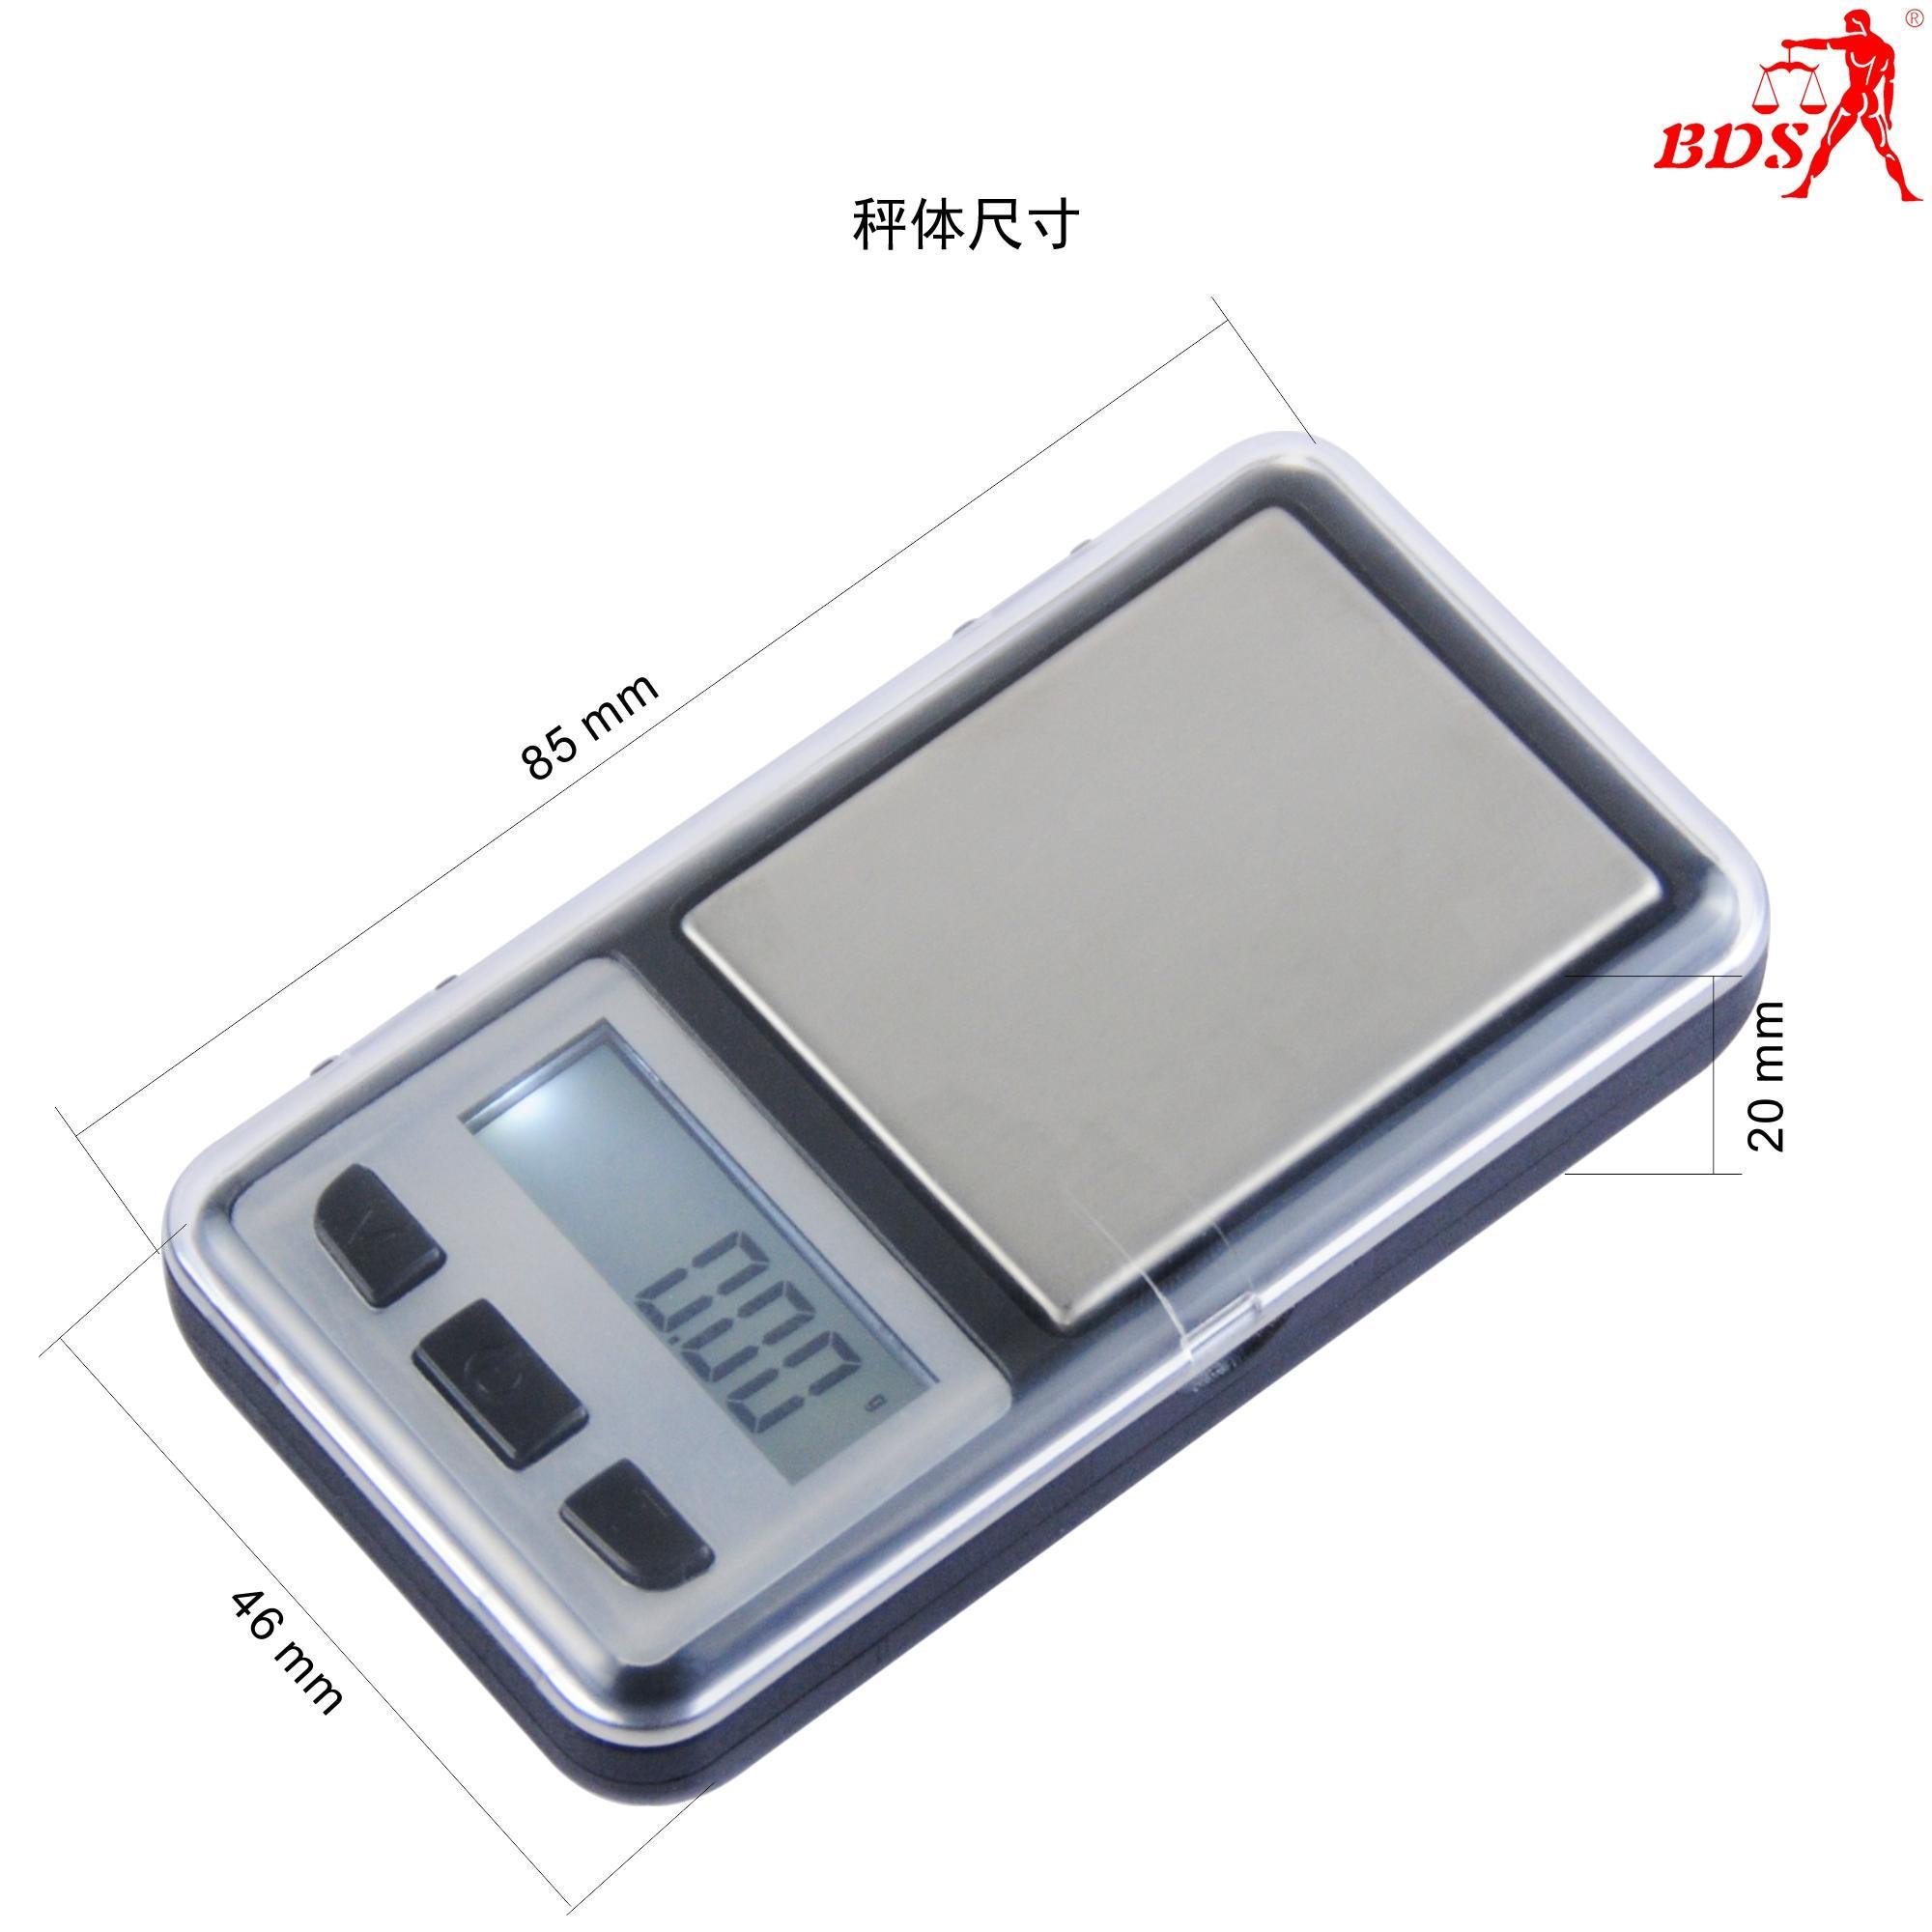 BDS6010便攜式電子口袋珠寶秤 5